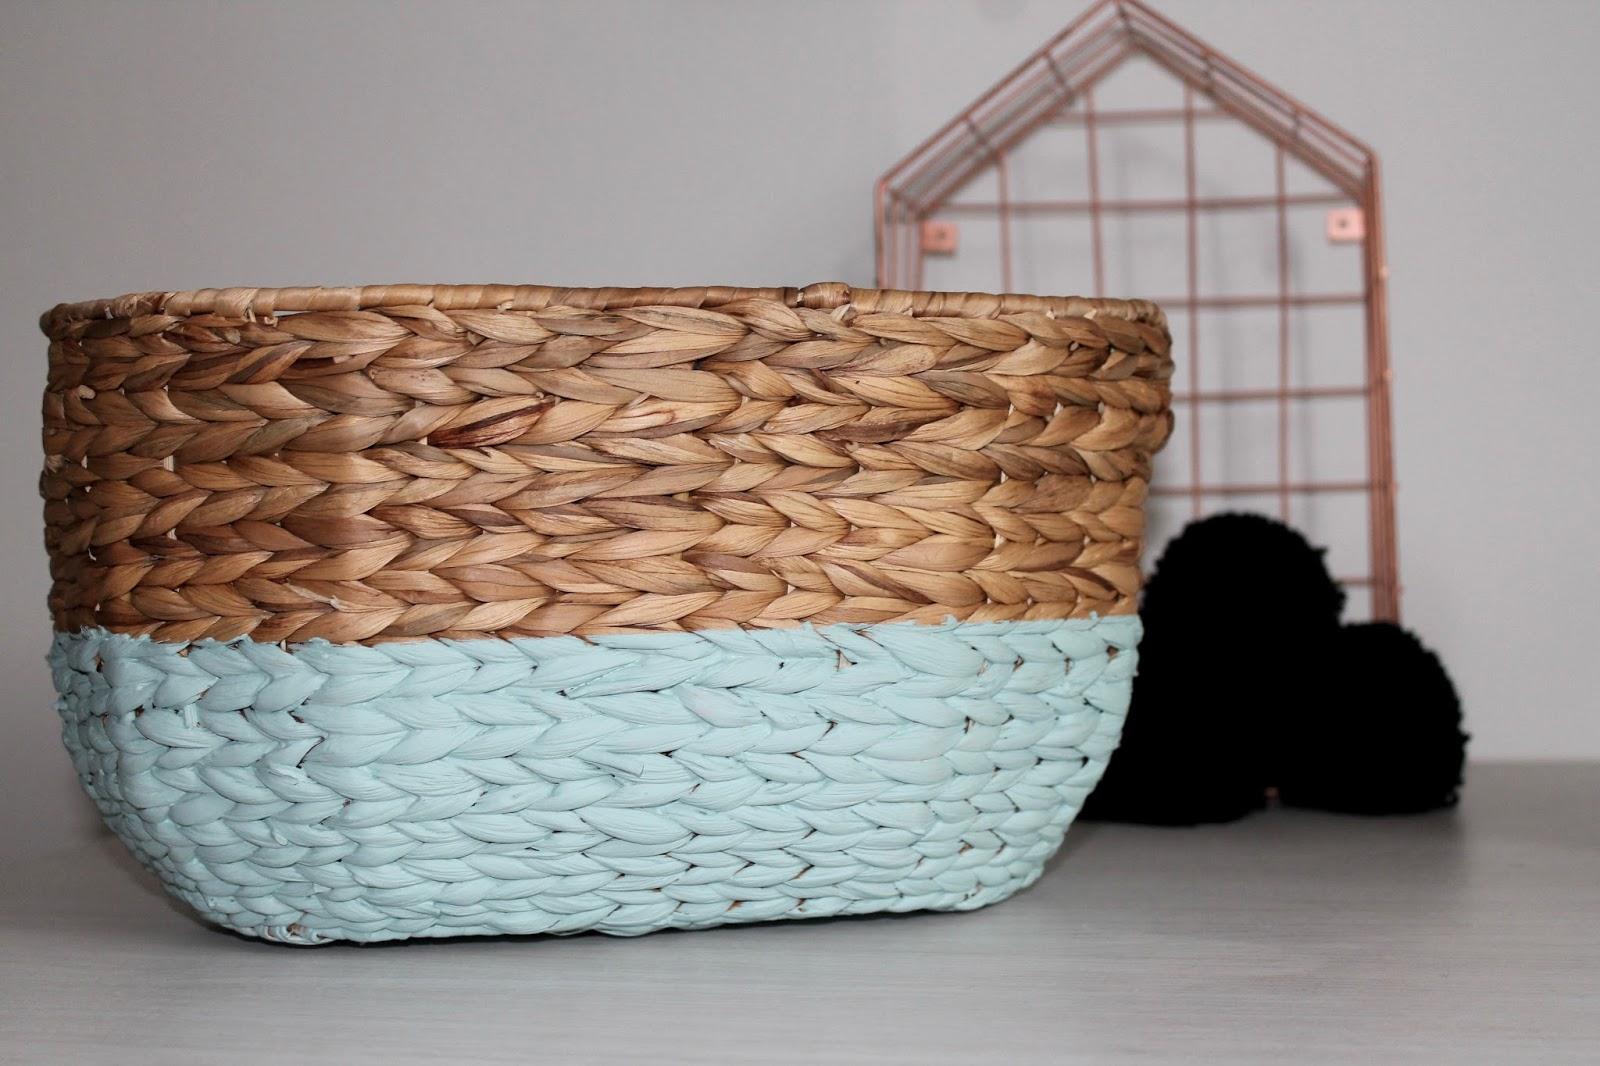 diy 7 panier pompon le monde de bubulle. Black Bedroom Furniture Sets. Home Design Ideas